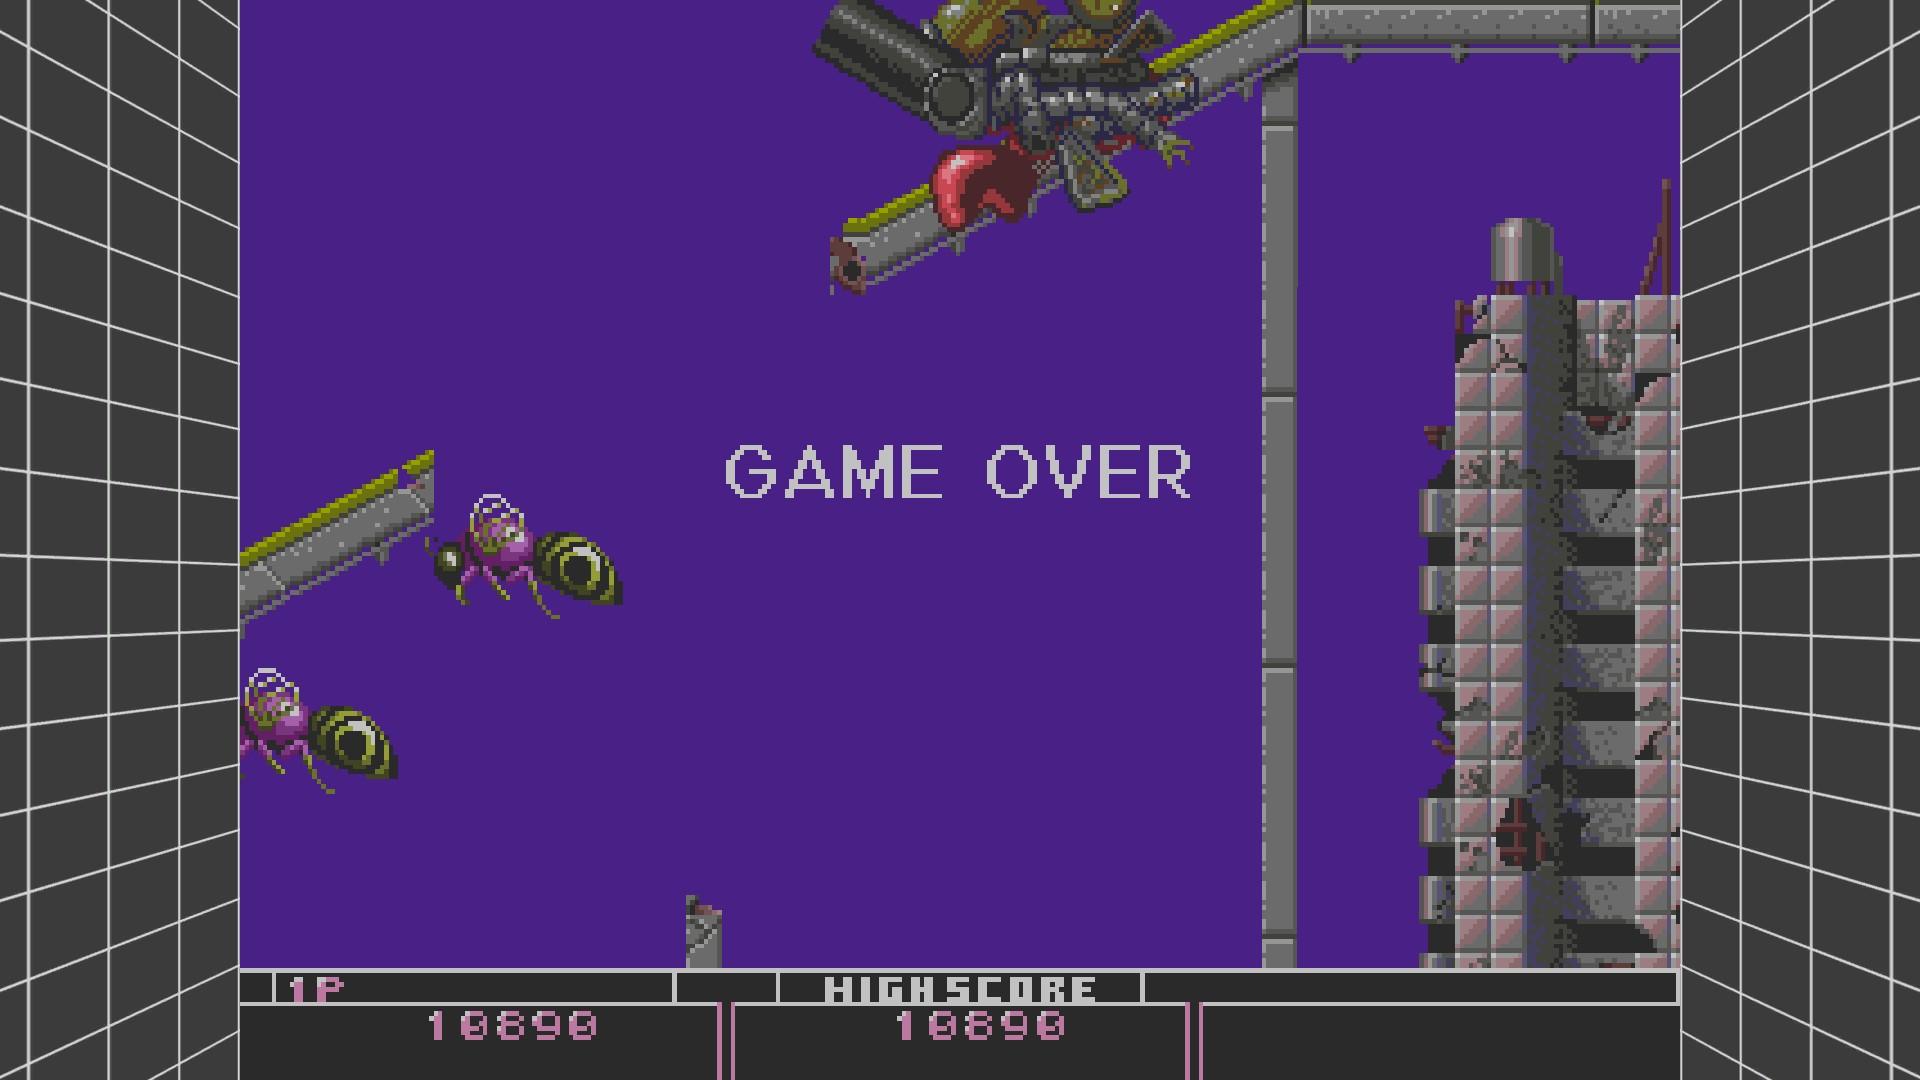 AkinNahtanoj: SEGA Genesis/Mega Drive Classics Volume 3: Bio-Hazard Battle [Normal] (PC) 10,890 points on 2020-08-19 07:03:12